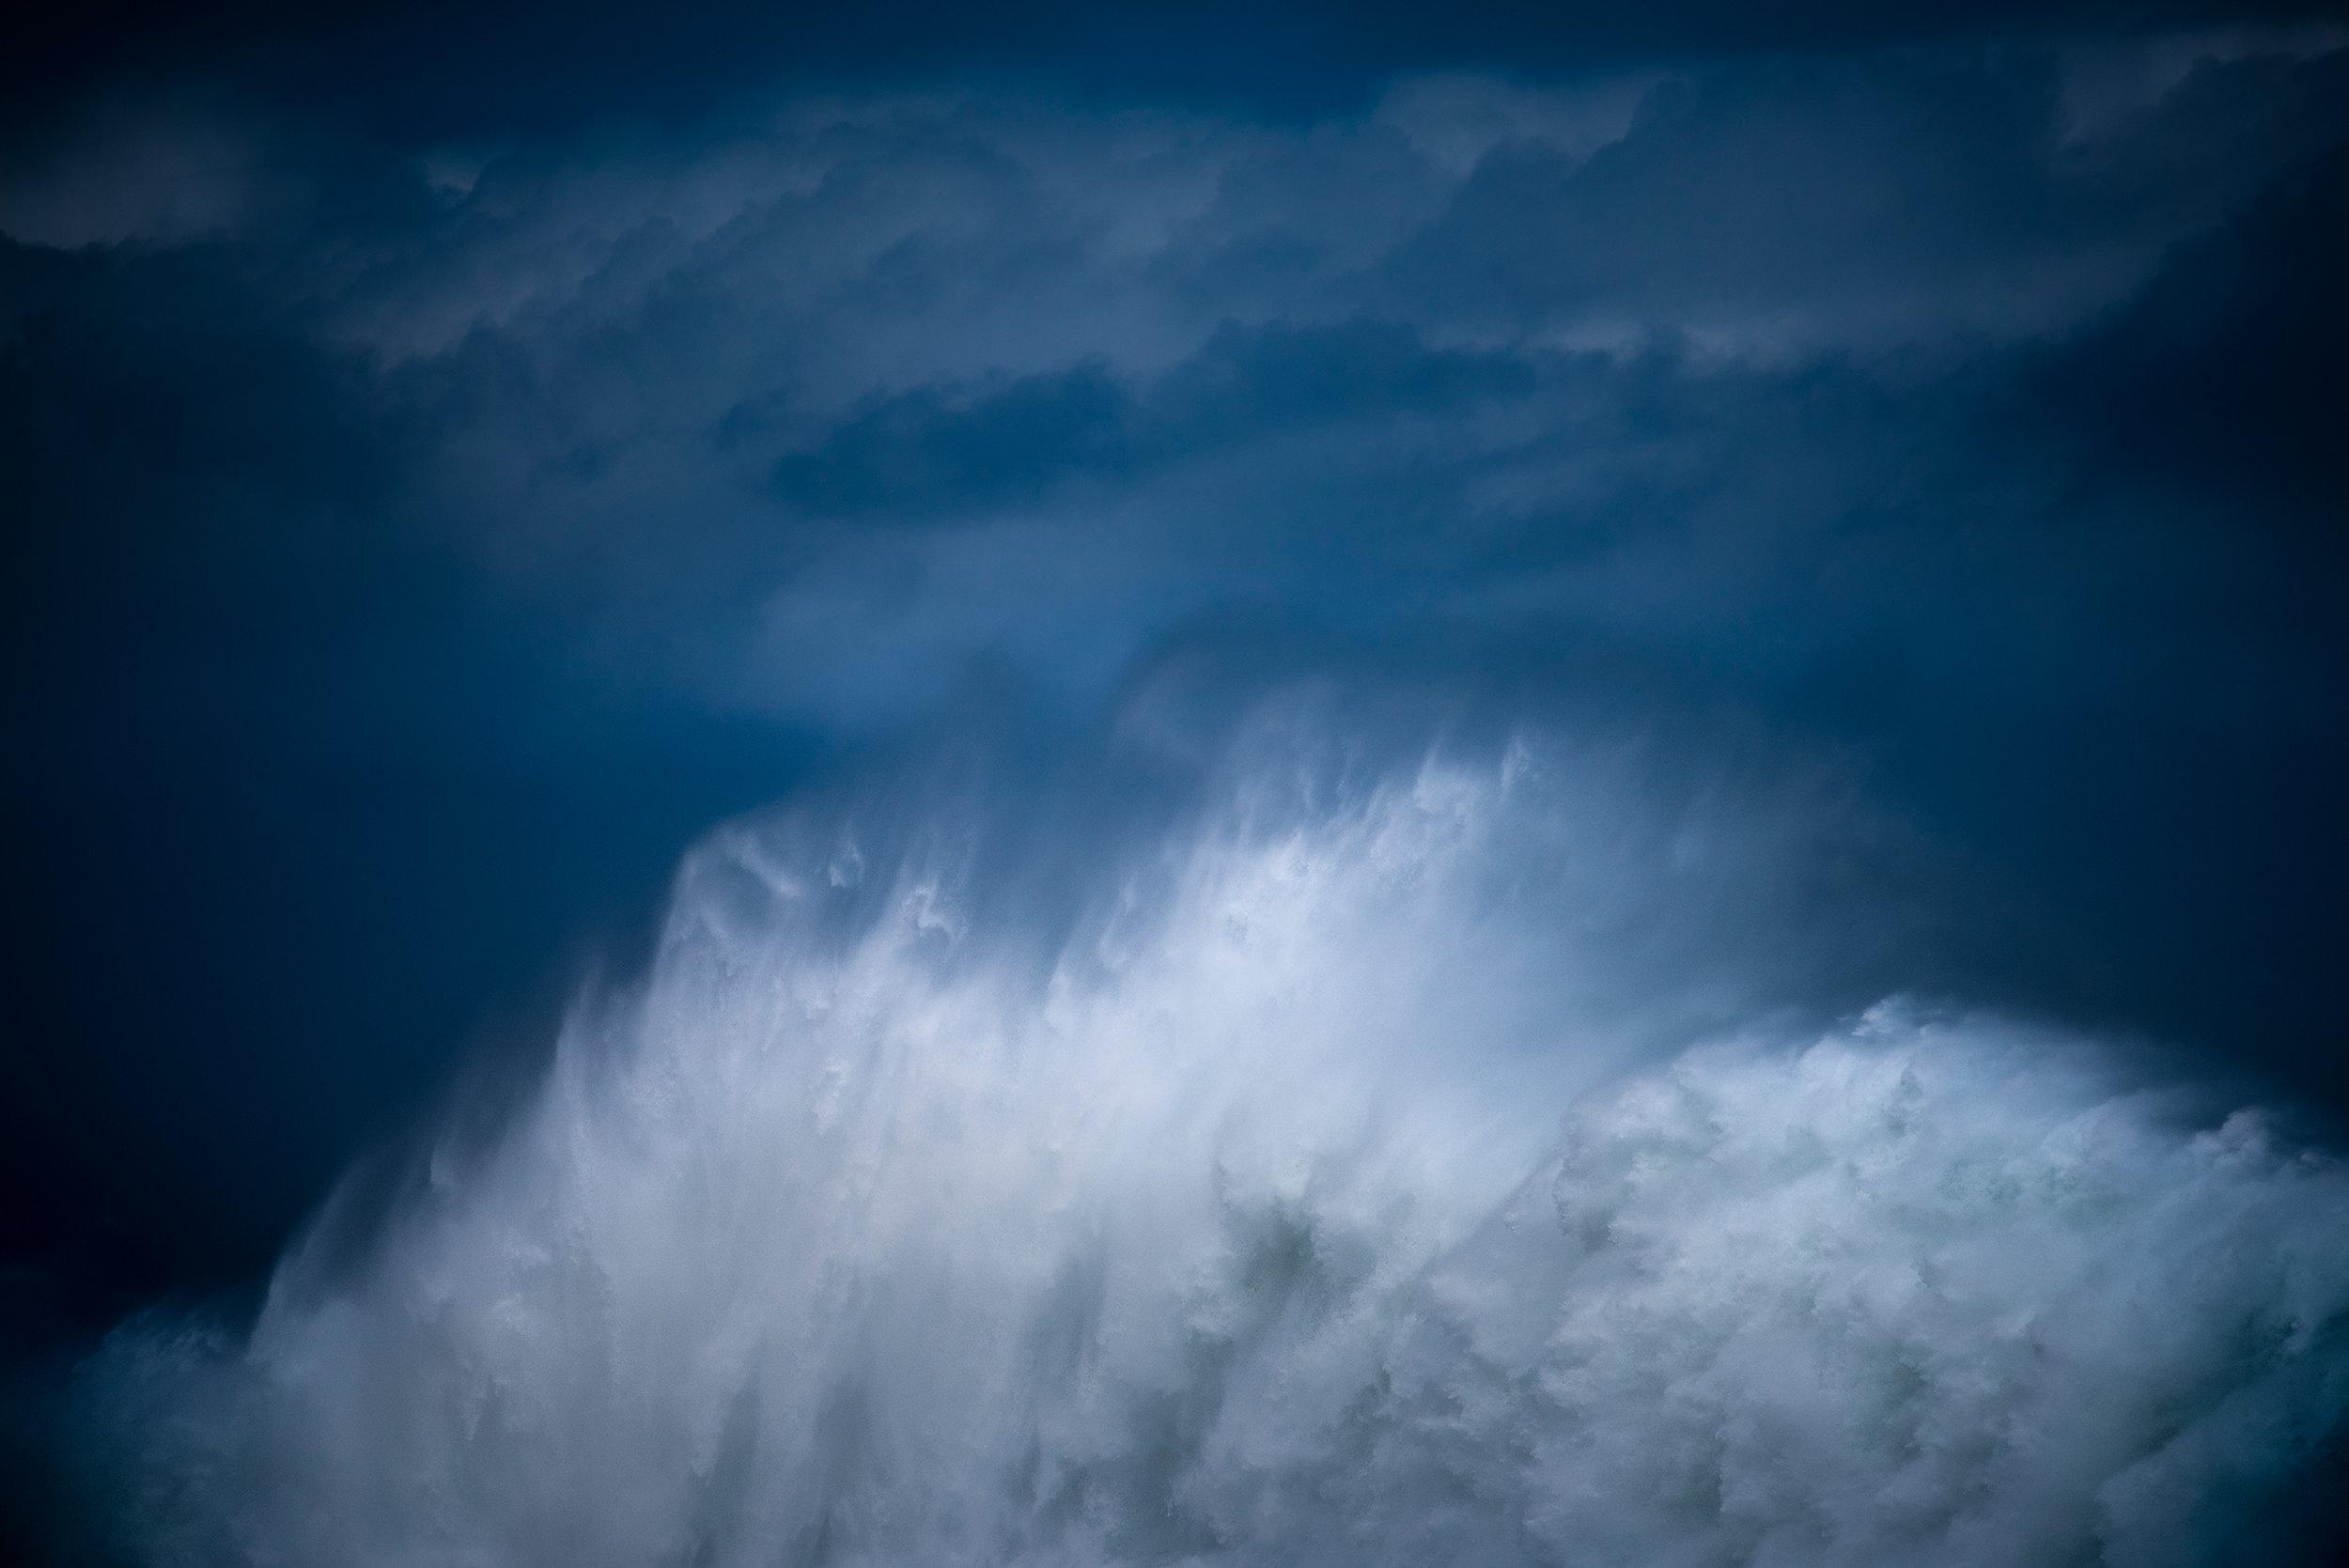 Alter-View Photography Showcase Photography Showcase Luke Shadbolt10.jpg